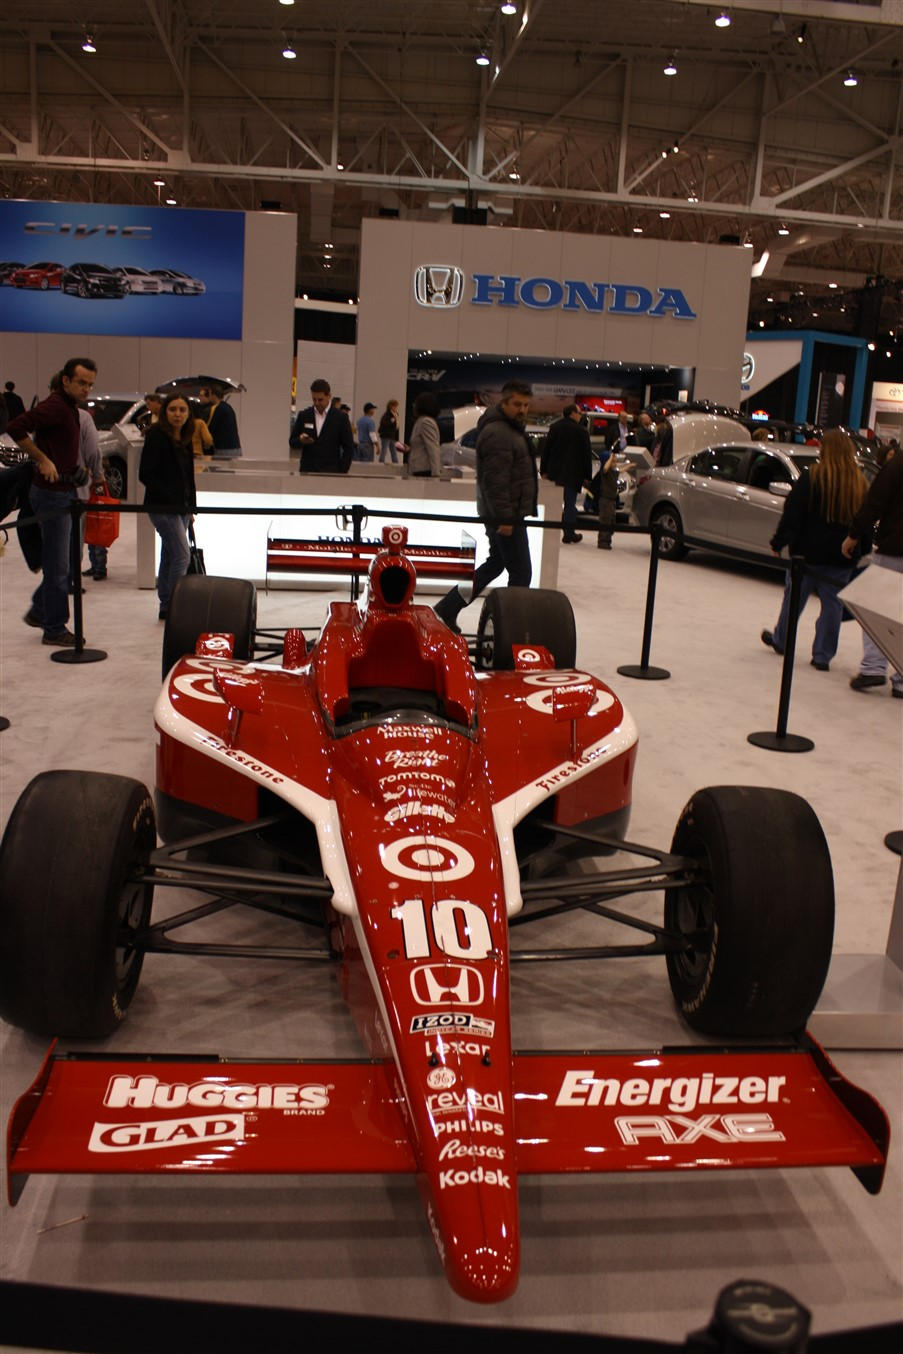 2012 02 25 Cleveland Auto Show 97.jpg